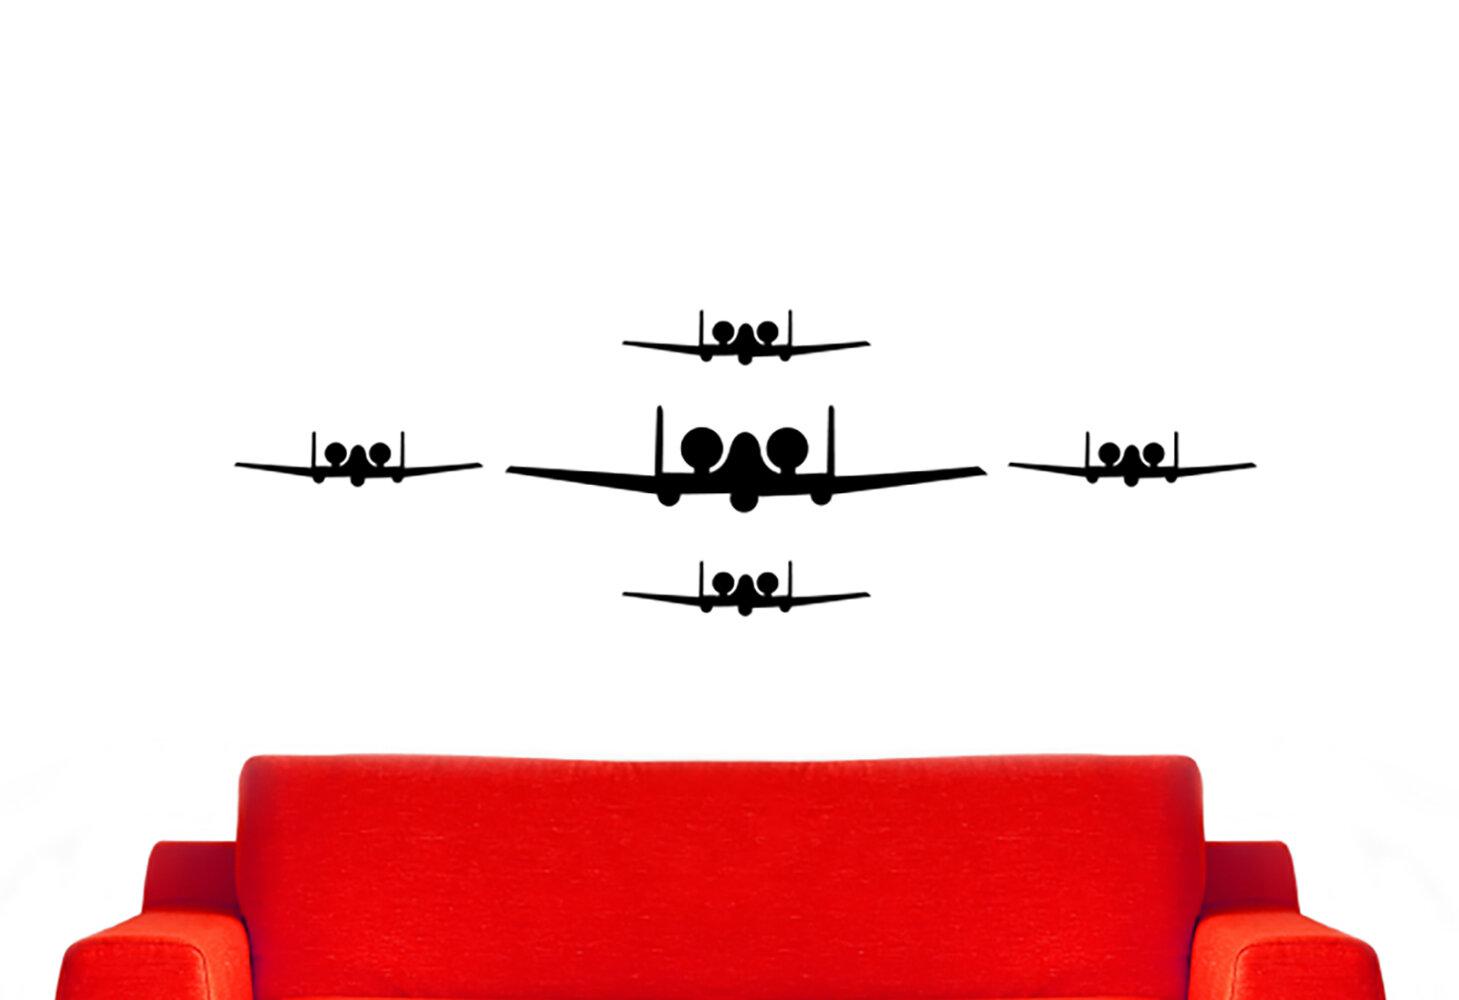 Williston Forge A 10 Warthog Fighter Jet Airplanes Silhouette Vinyl Words Wall Decal Wayfair